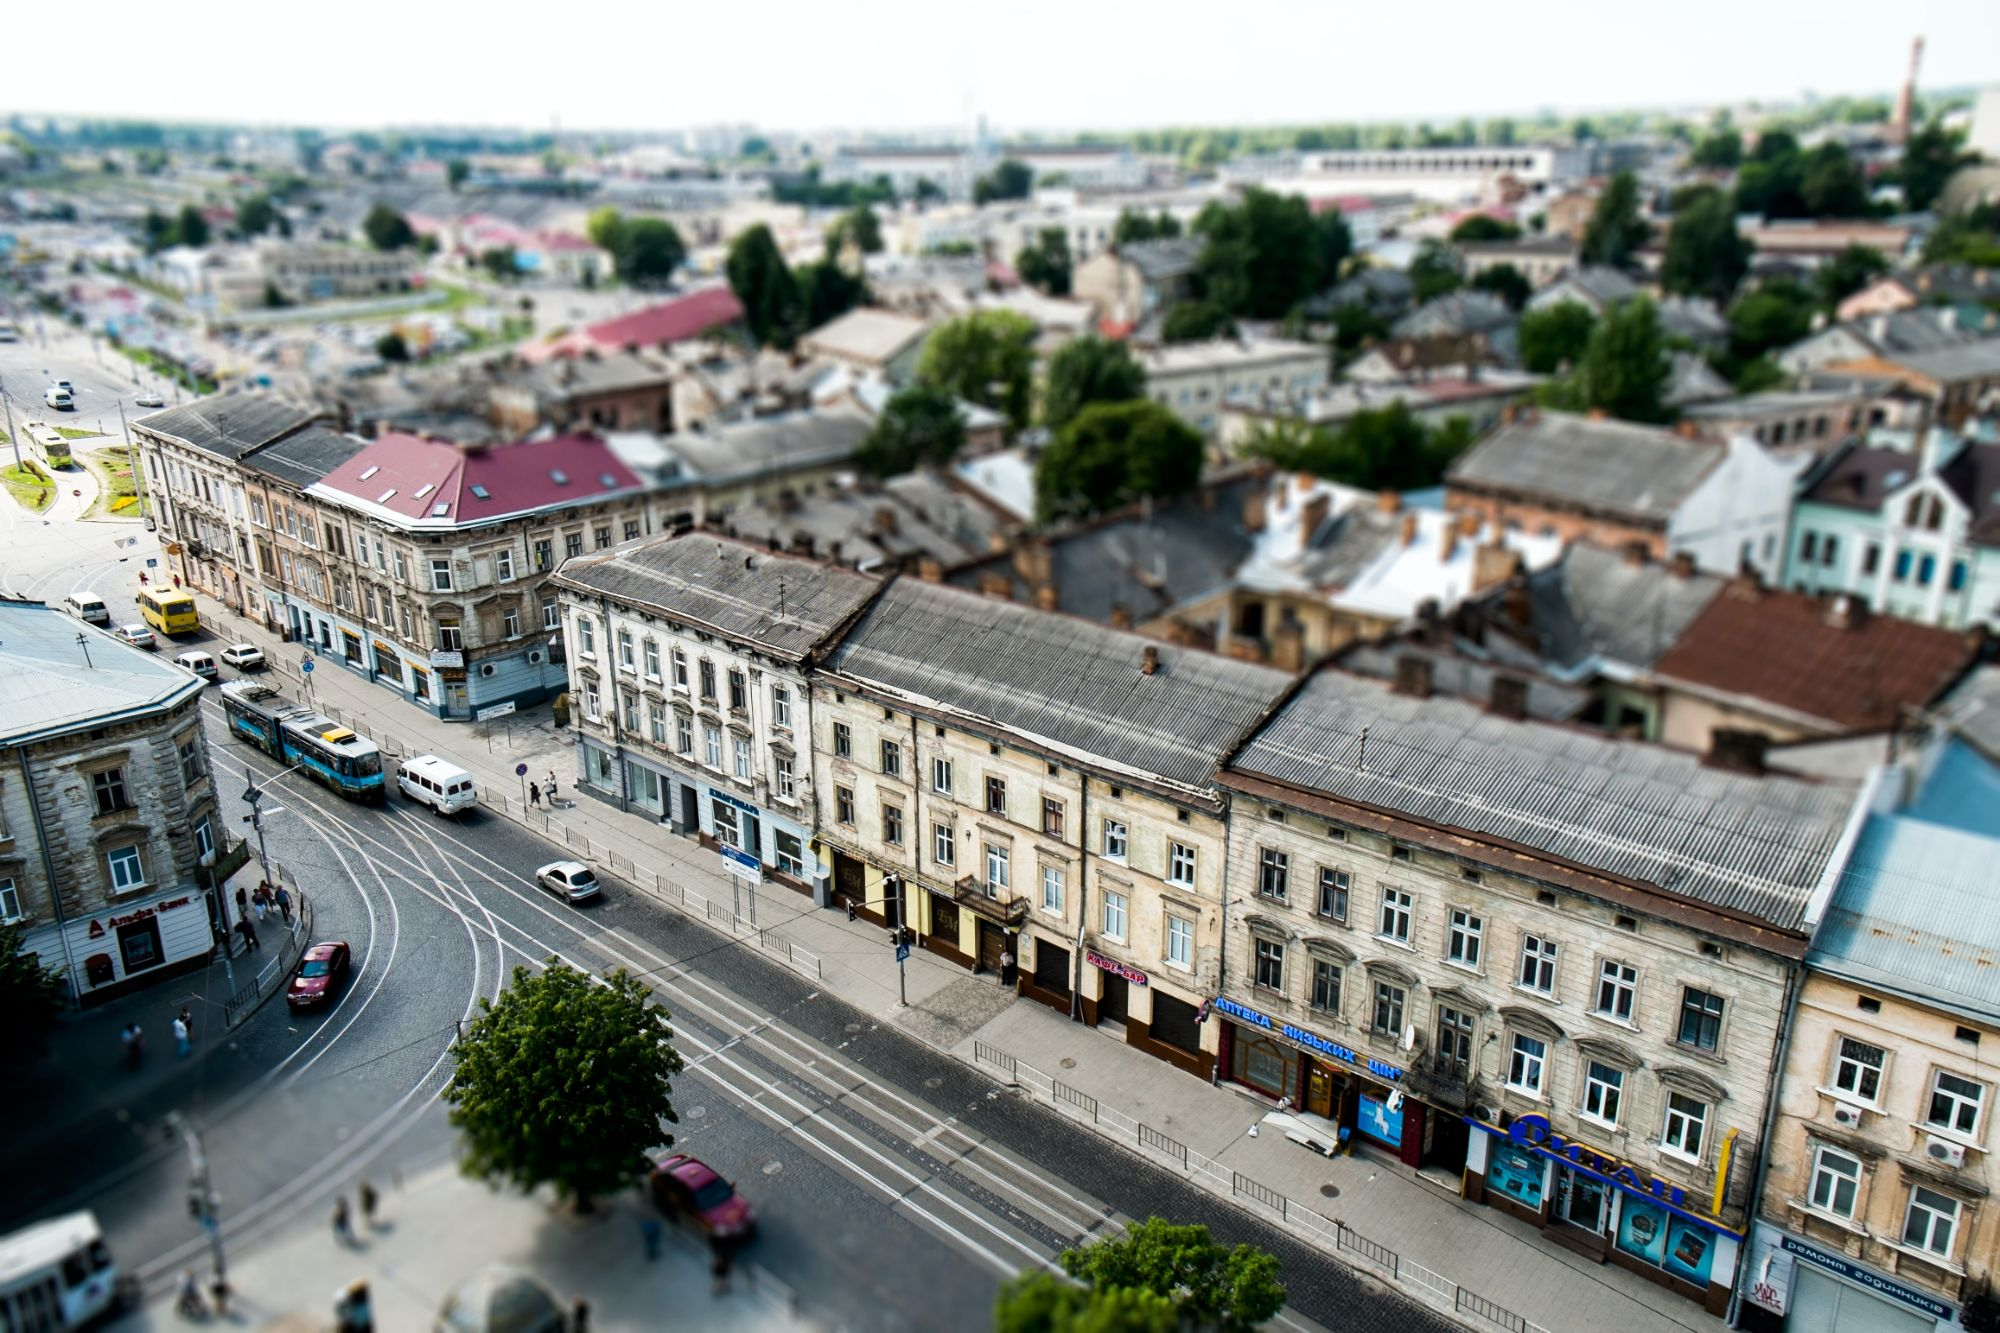 Aeriel view of a high street